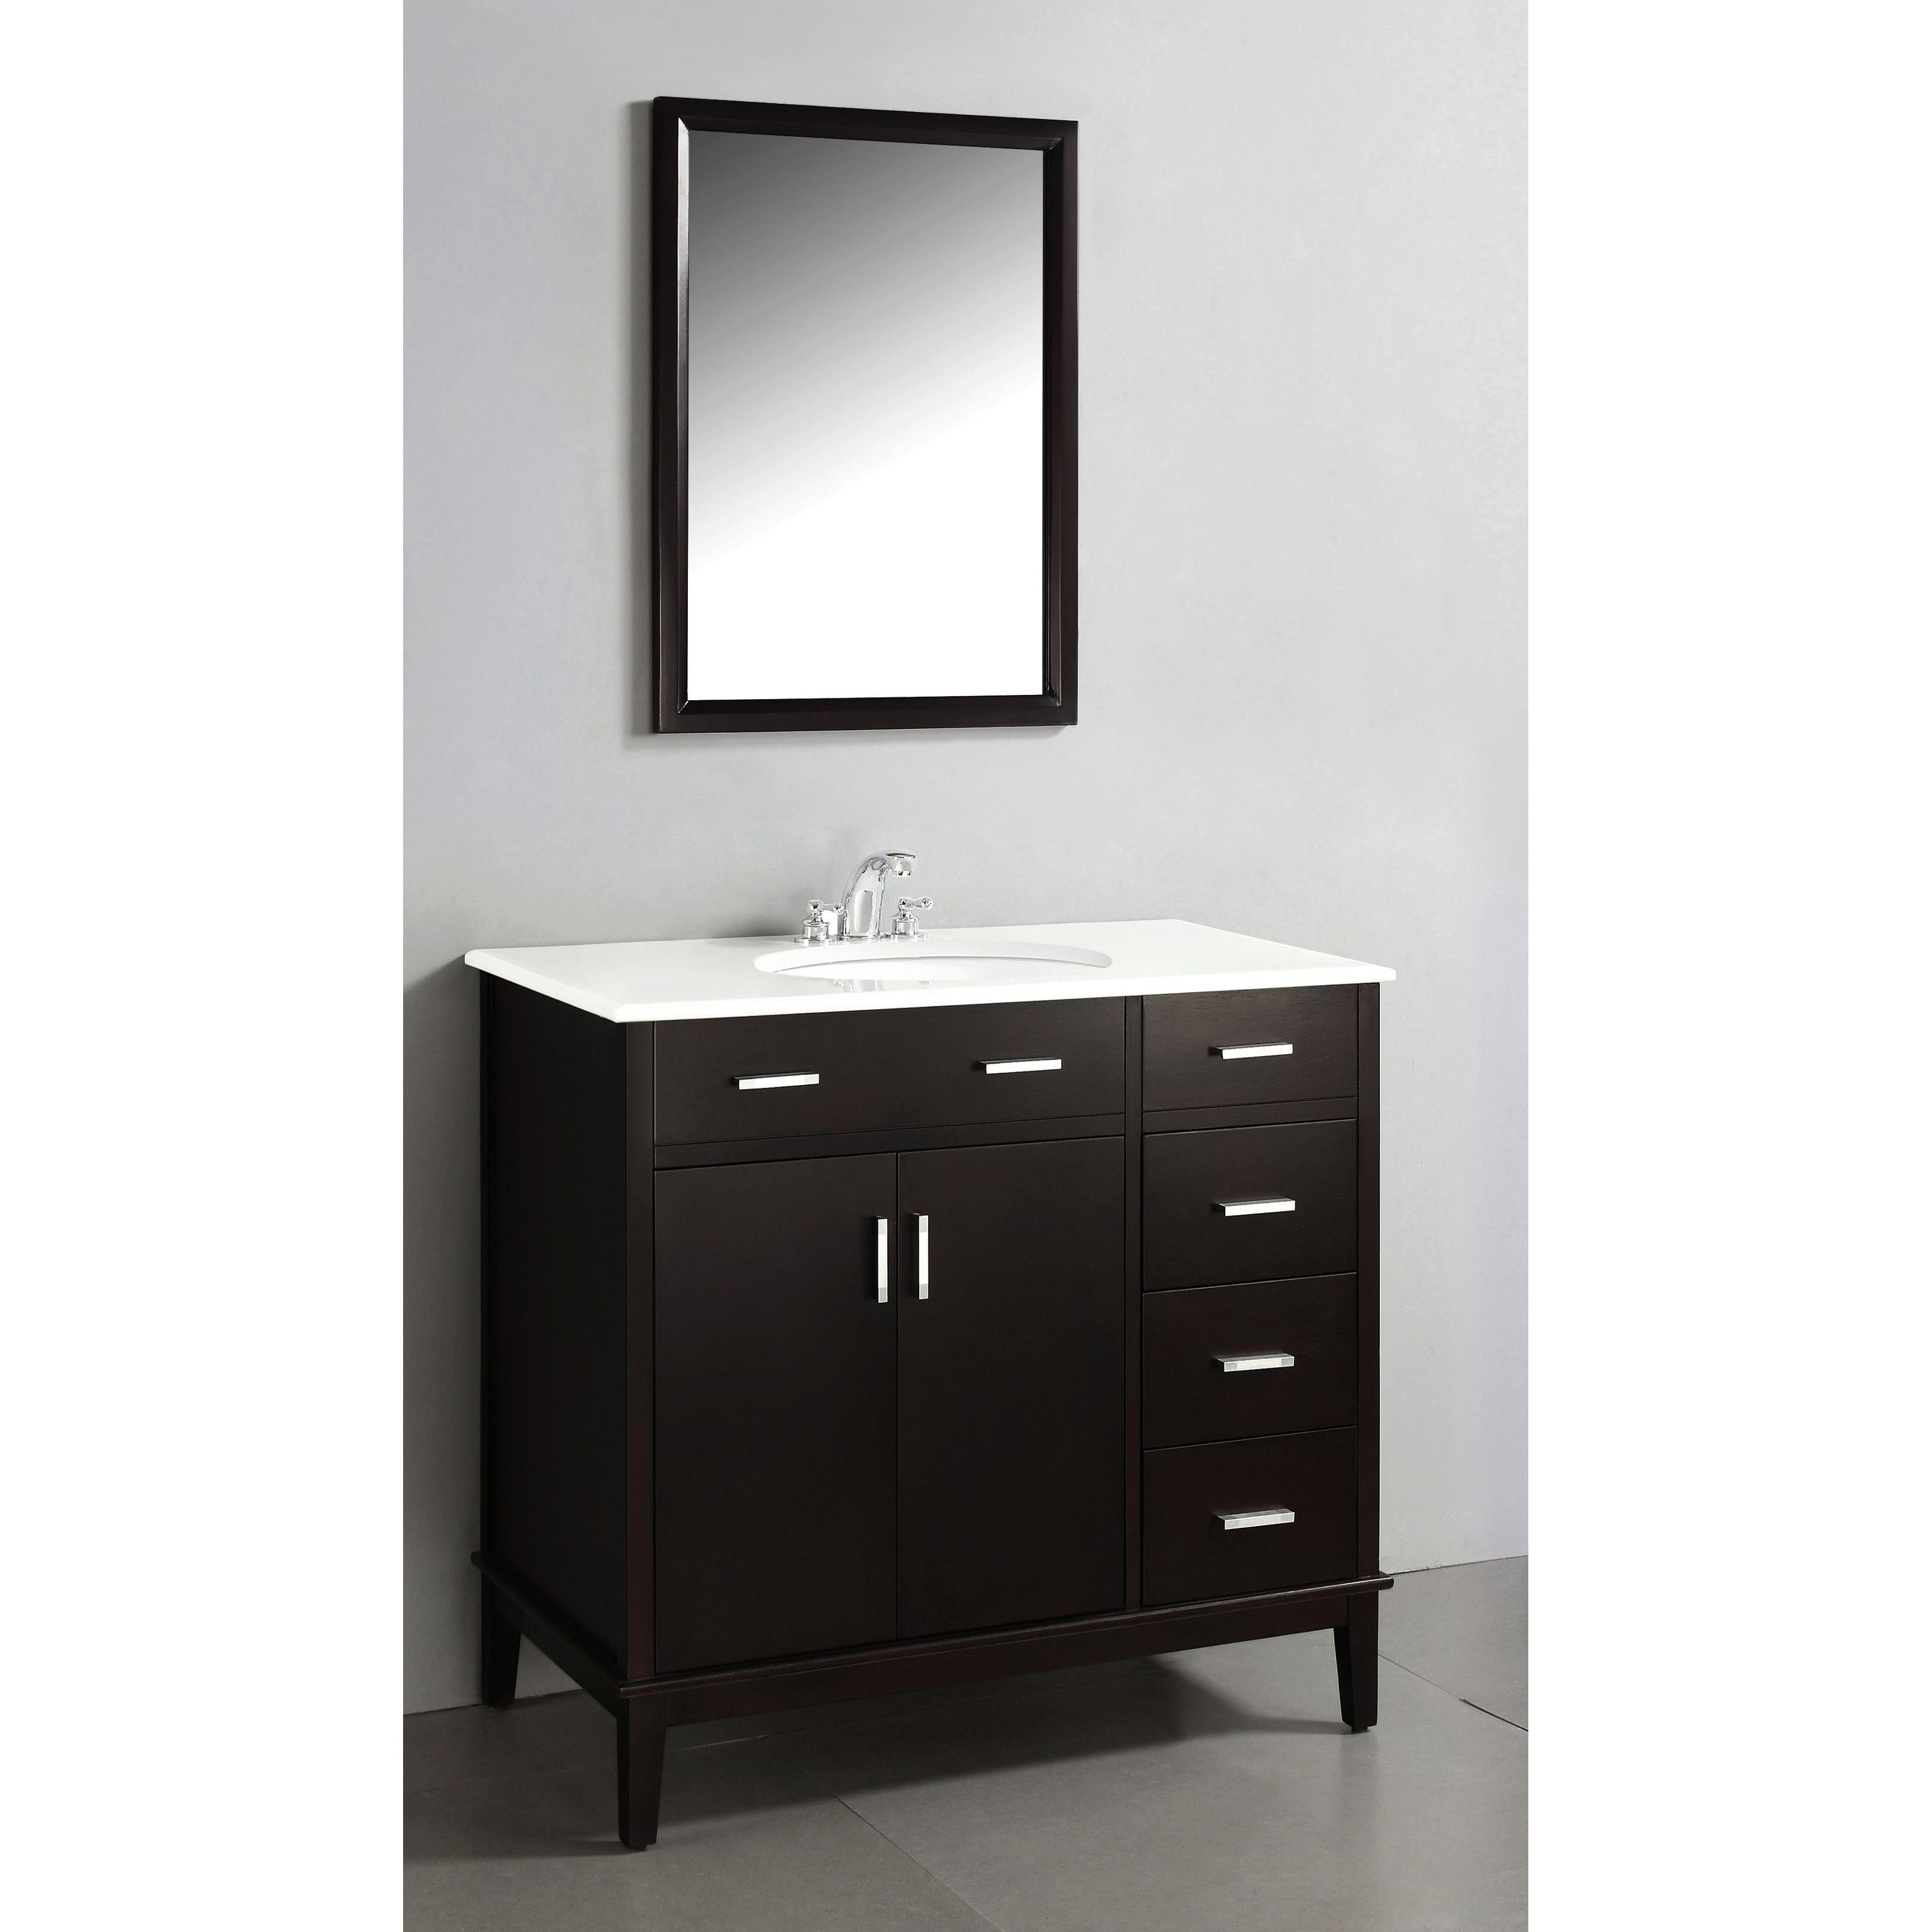 Innovative  Carlyle White 2door 36inch Bath Vanity Set With Black Granite Top